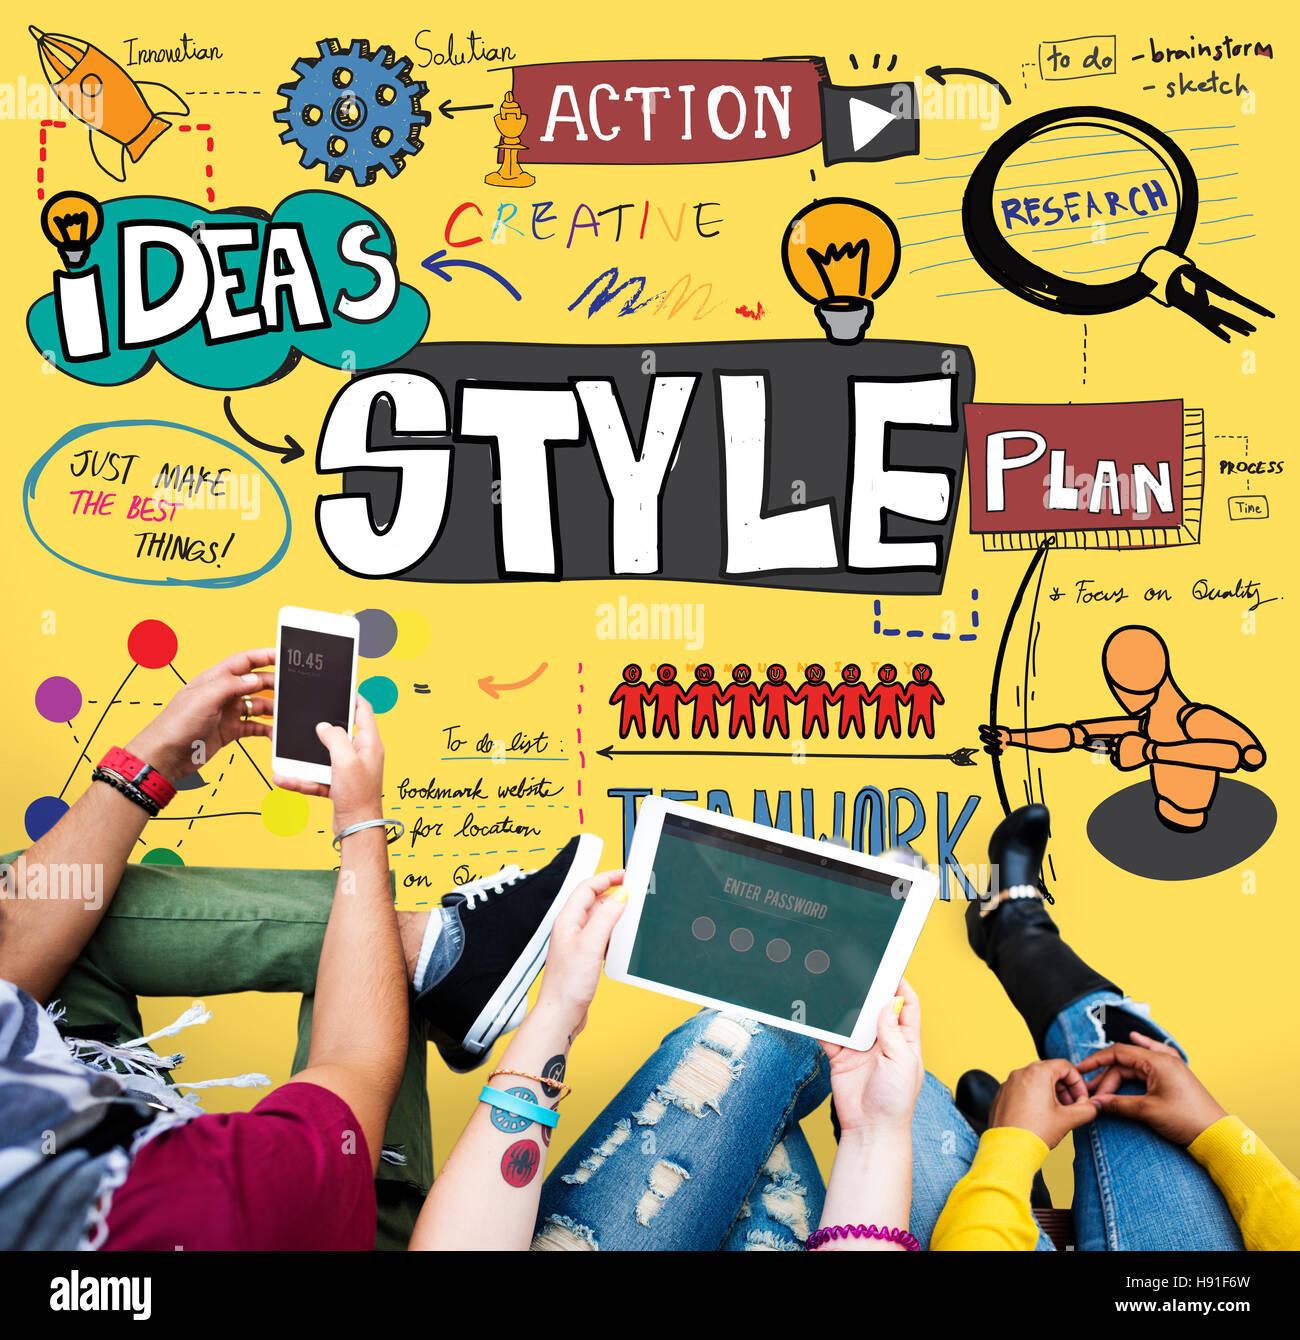 Style Posh Fashion Trendy Fashionista Concept - Stock Image